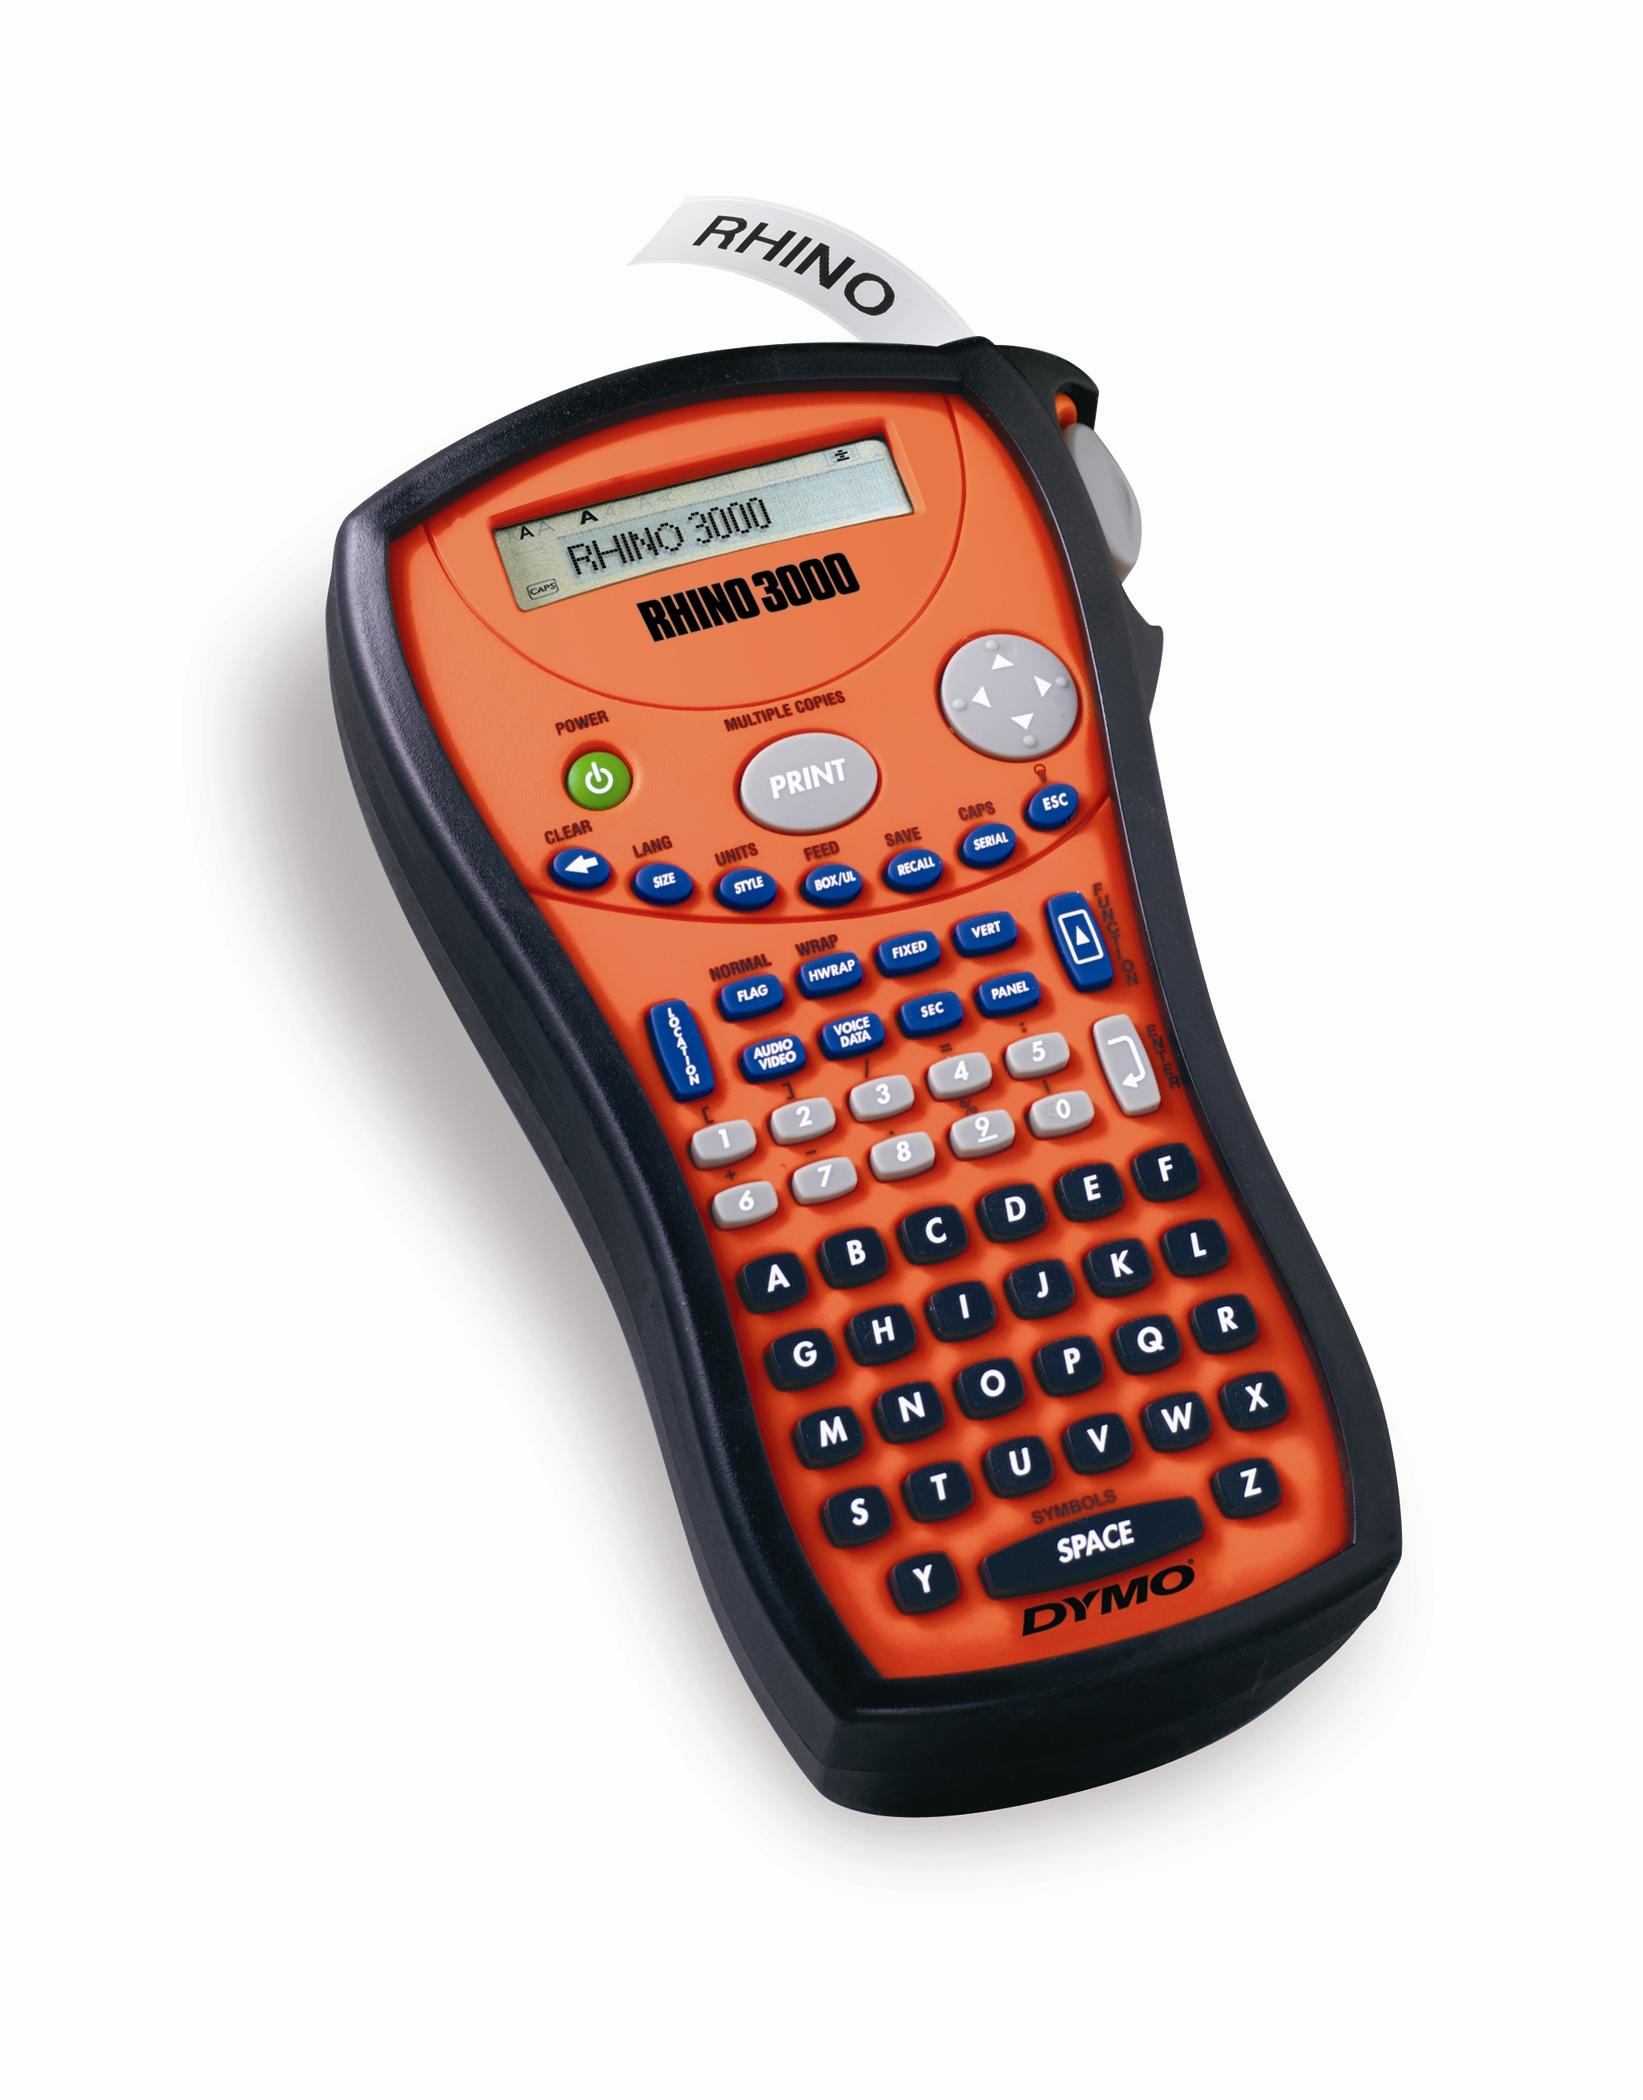 Dymo Rhino 3000 Professional label and heat shrink tubing printer